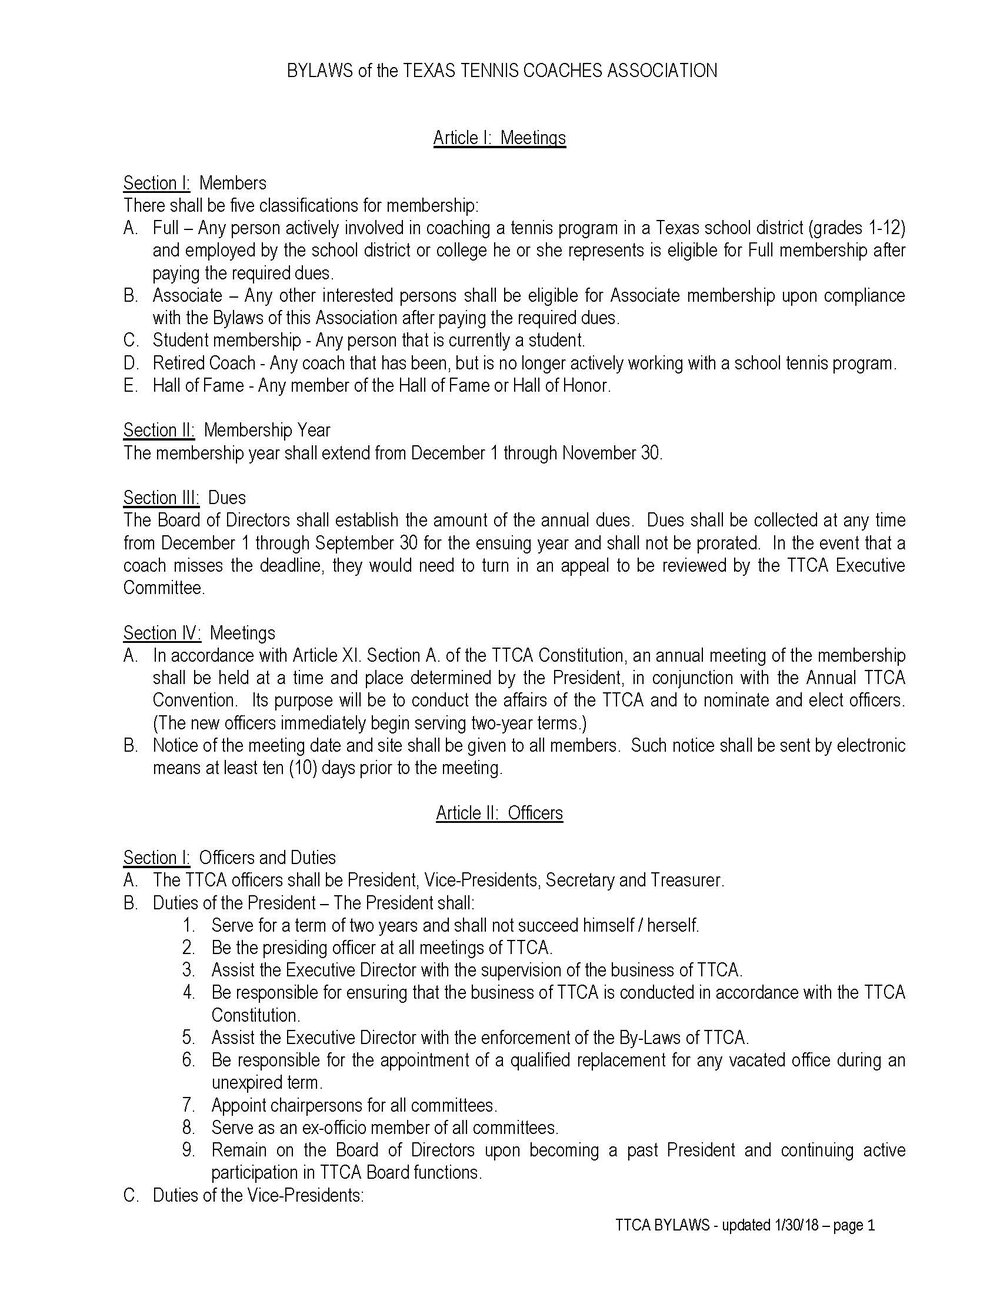 TTCA Bylaws_Page_1.jpg